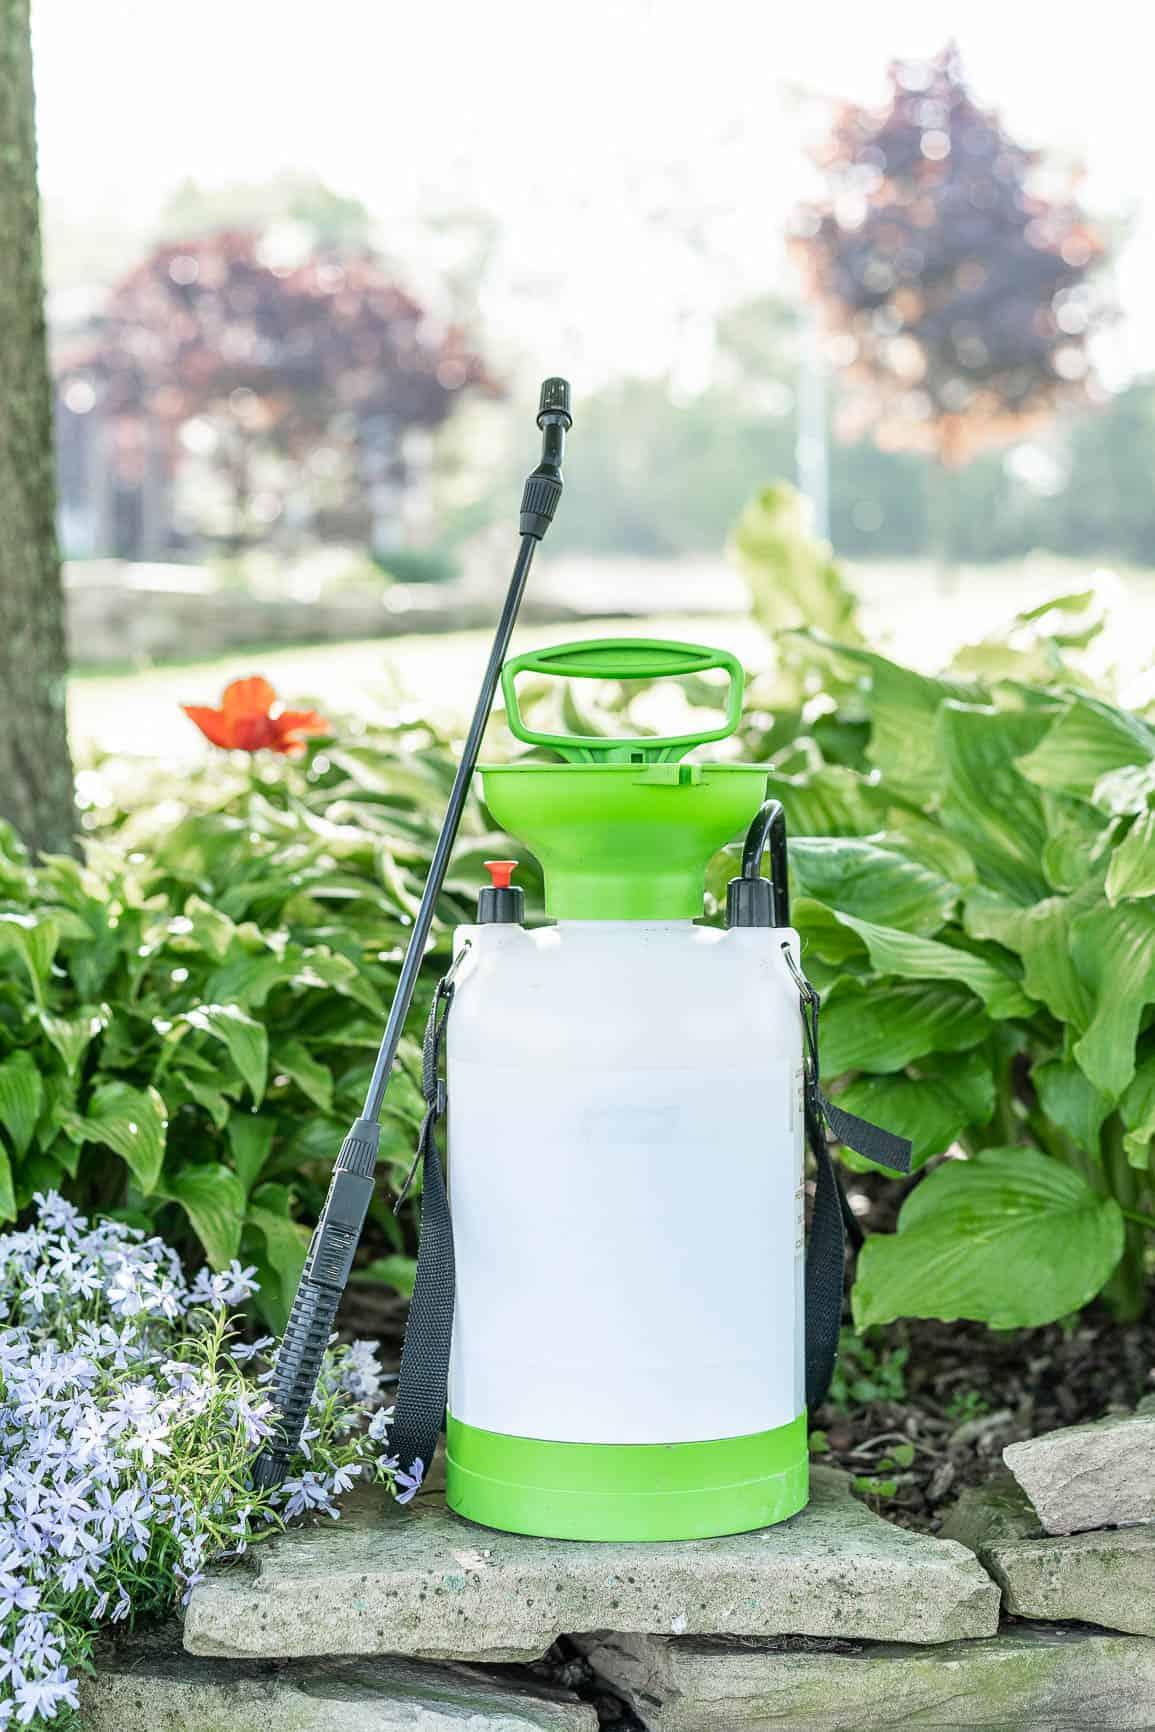 garden sprayer in front of landscaping